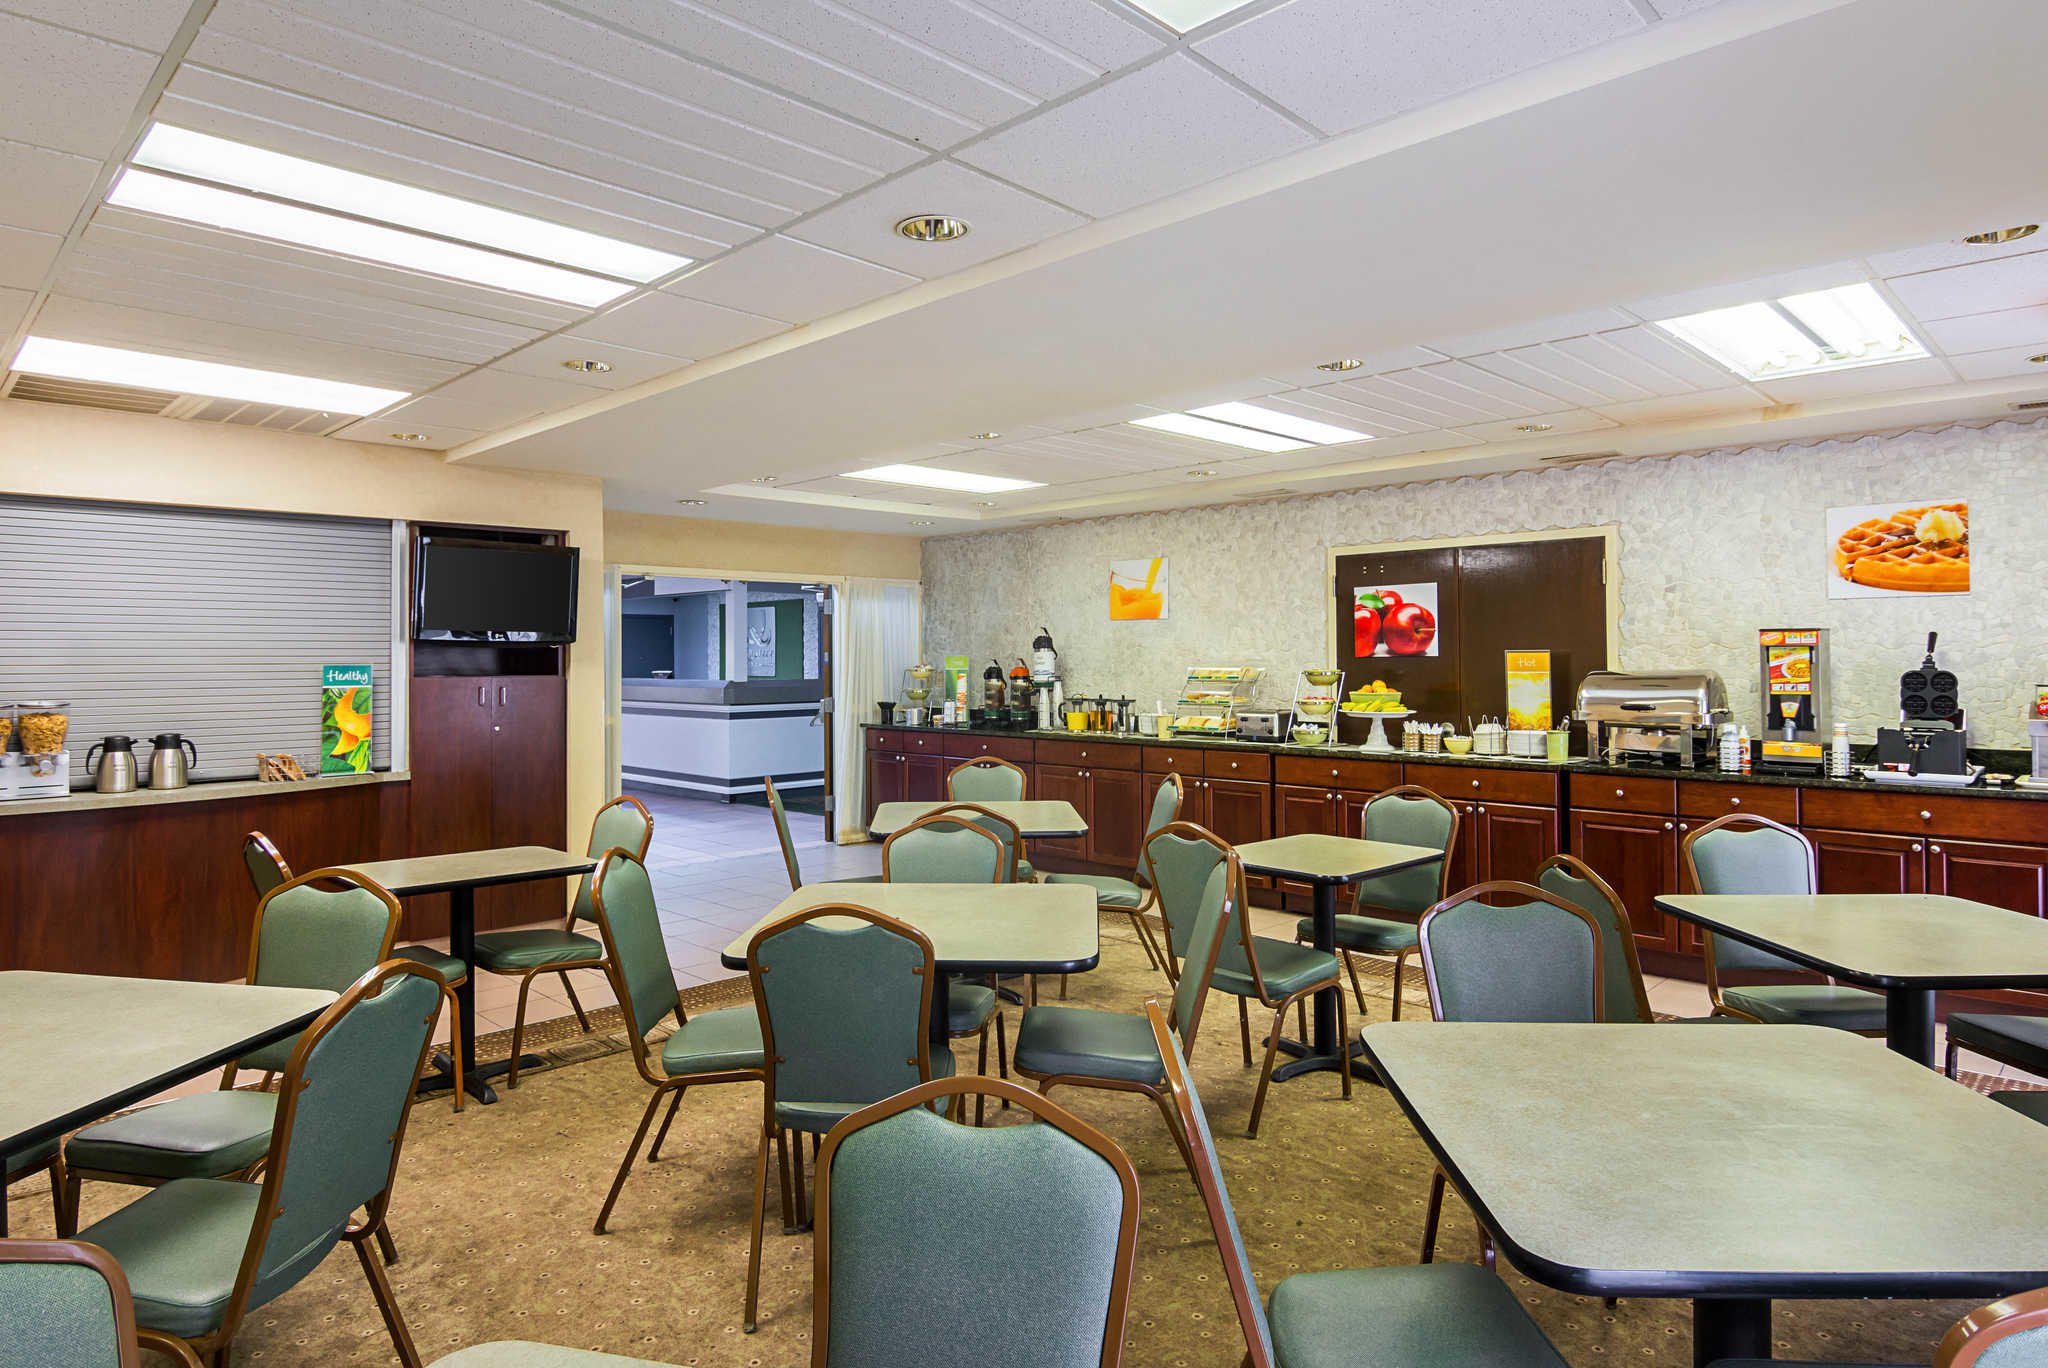 Quality Inn & Suites Kearneysville - Martinsburg image 23